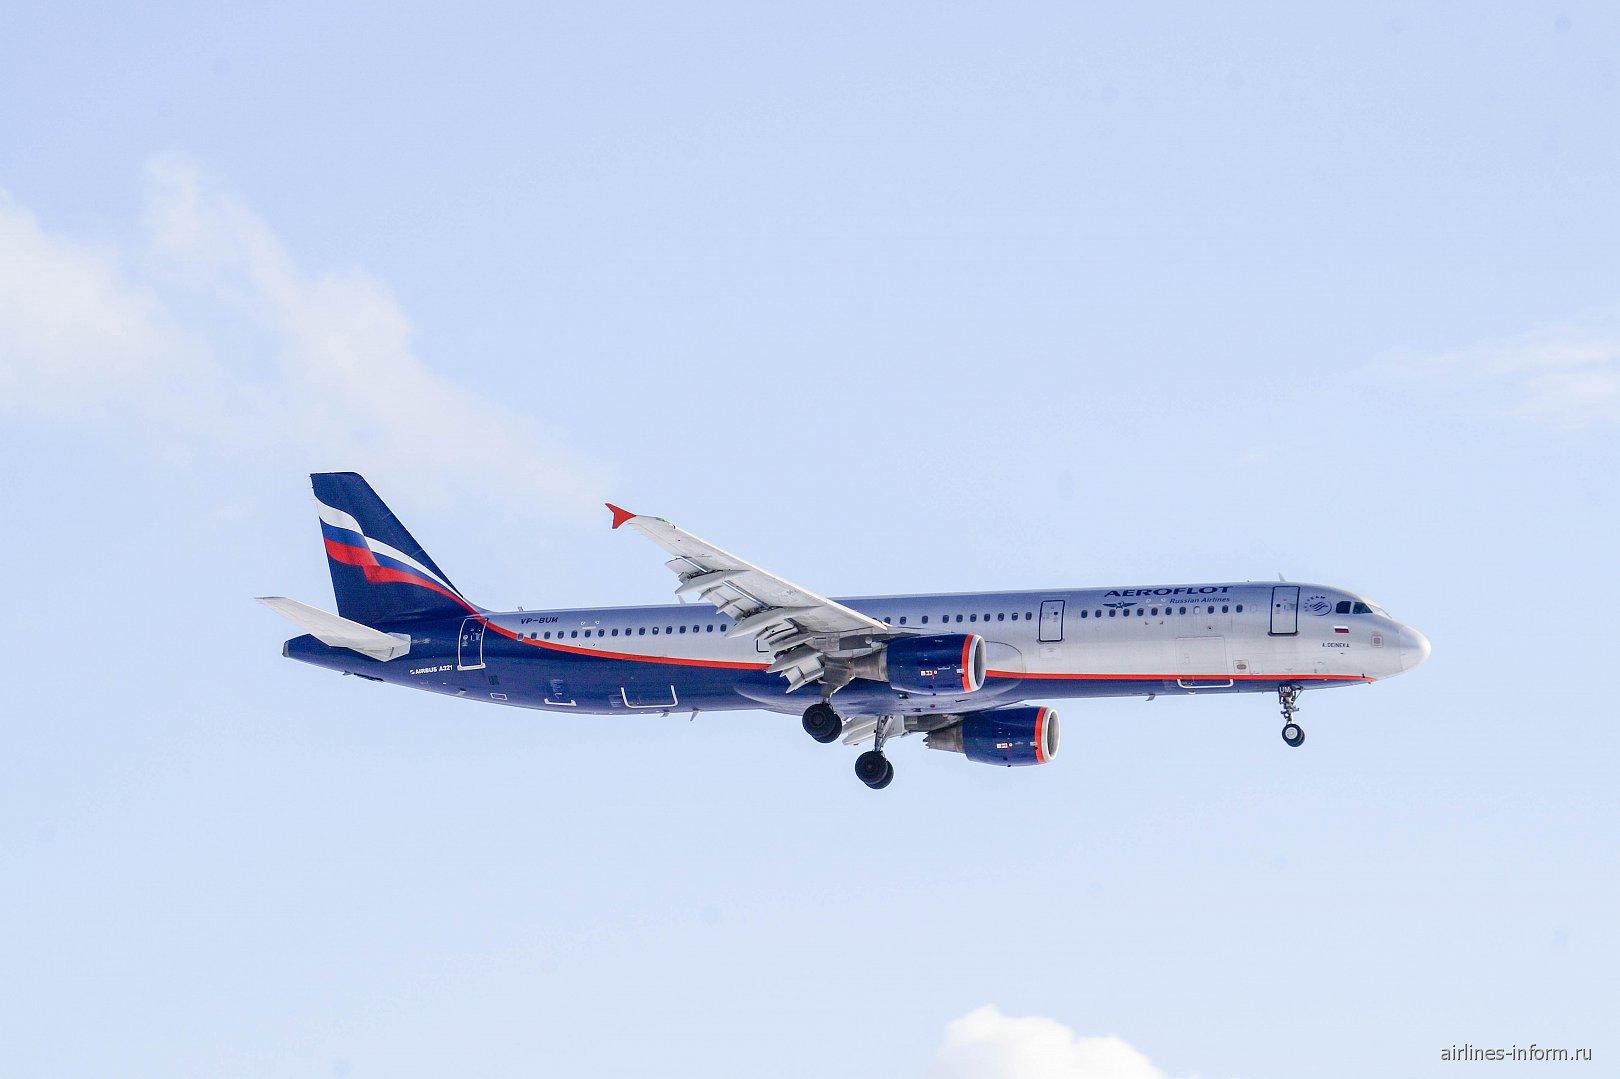 Самолет Аэрофлота Airbus A321 VP-BUN